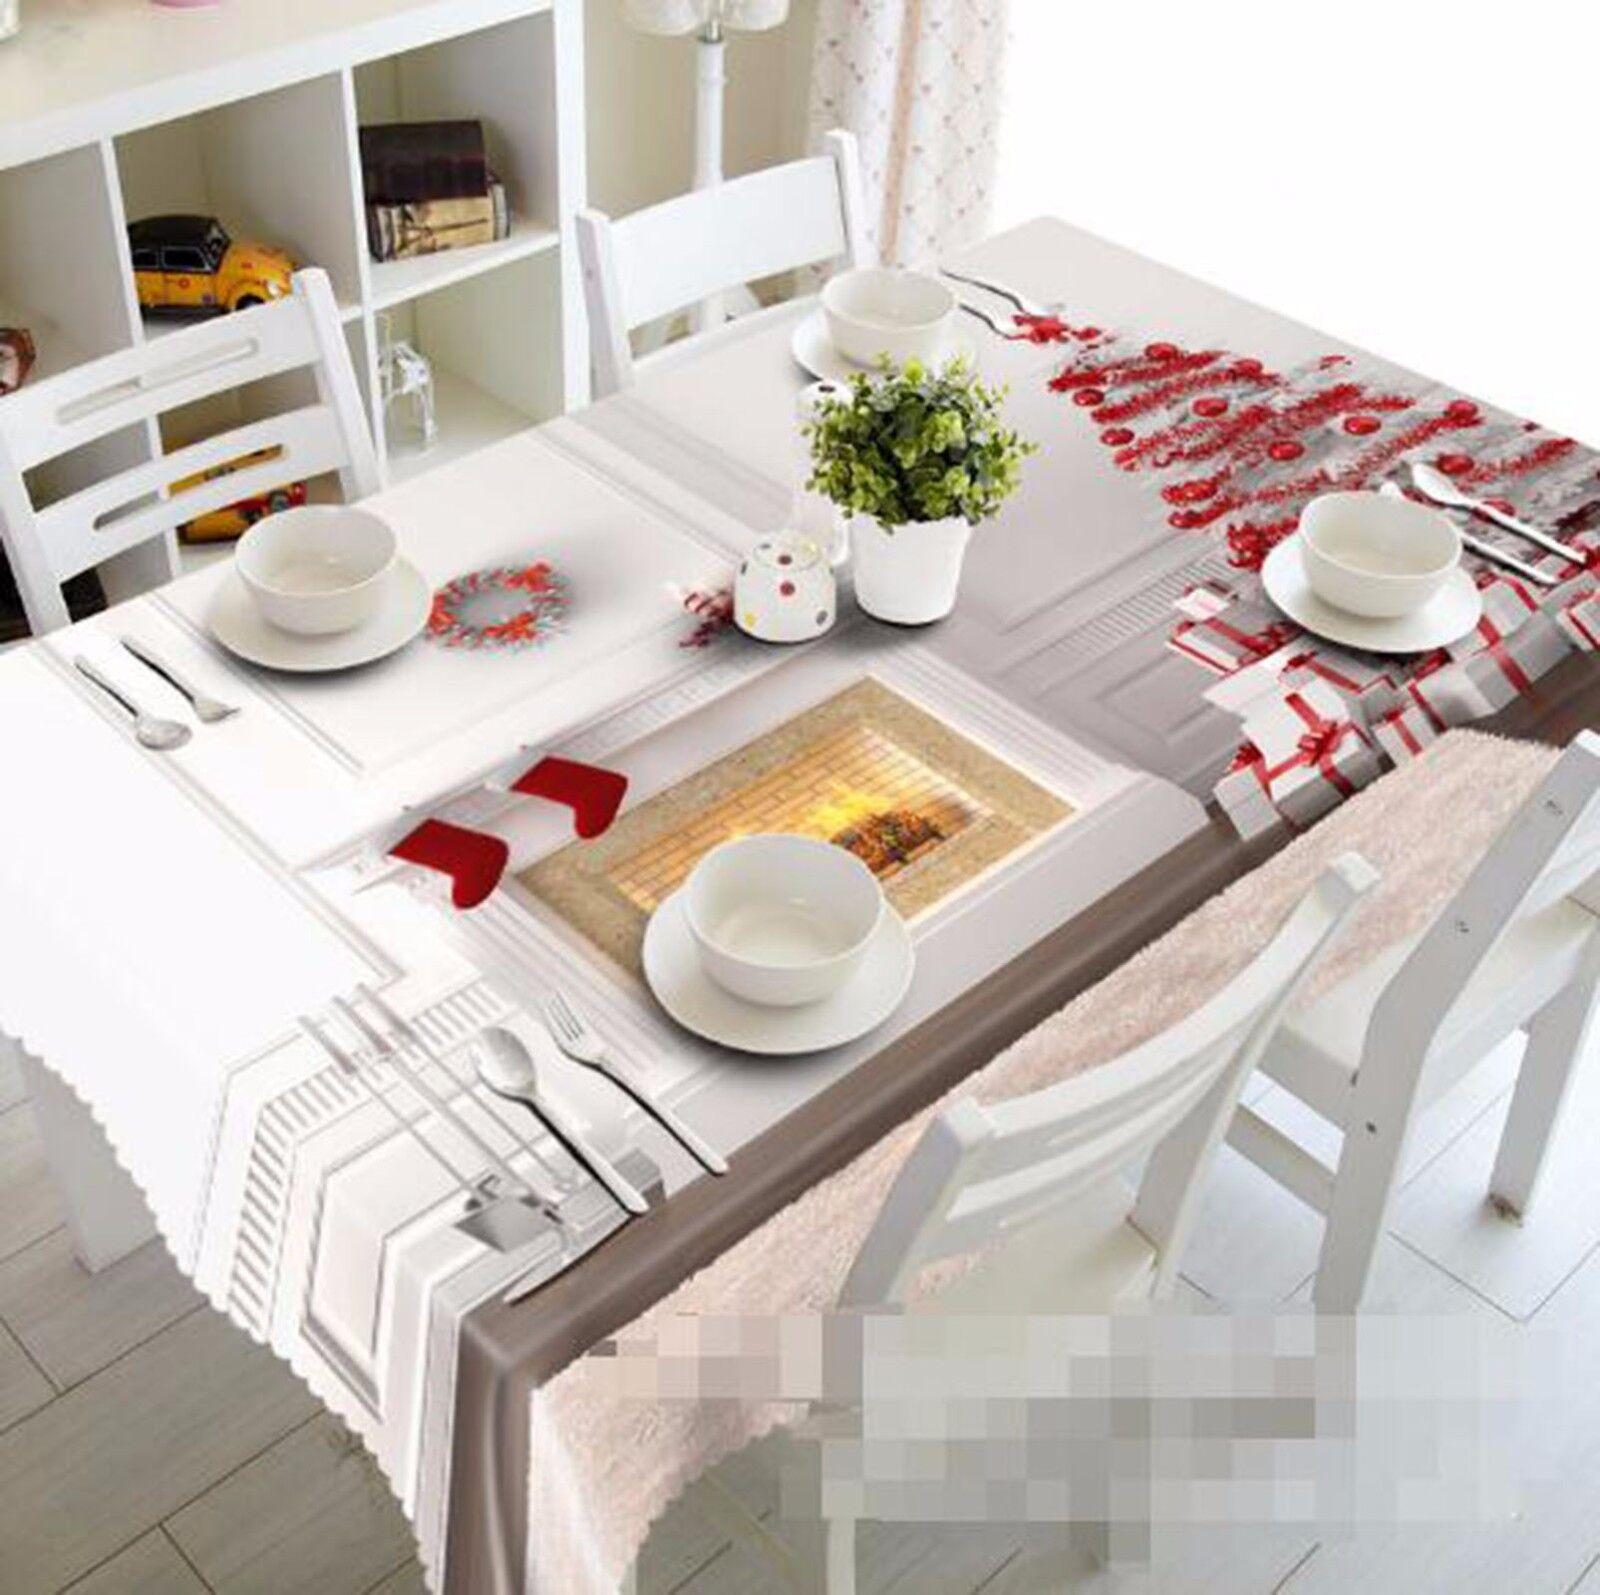 Pino 3D blancoo Mantel Mantel Paño Cumpleaños Fiesta AJ Wallpaper Reino Unido Limón